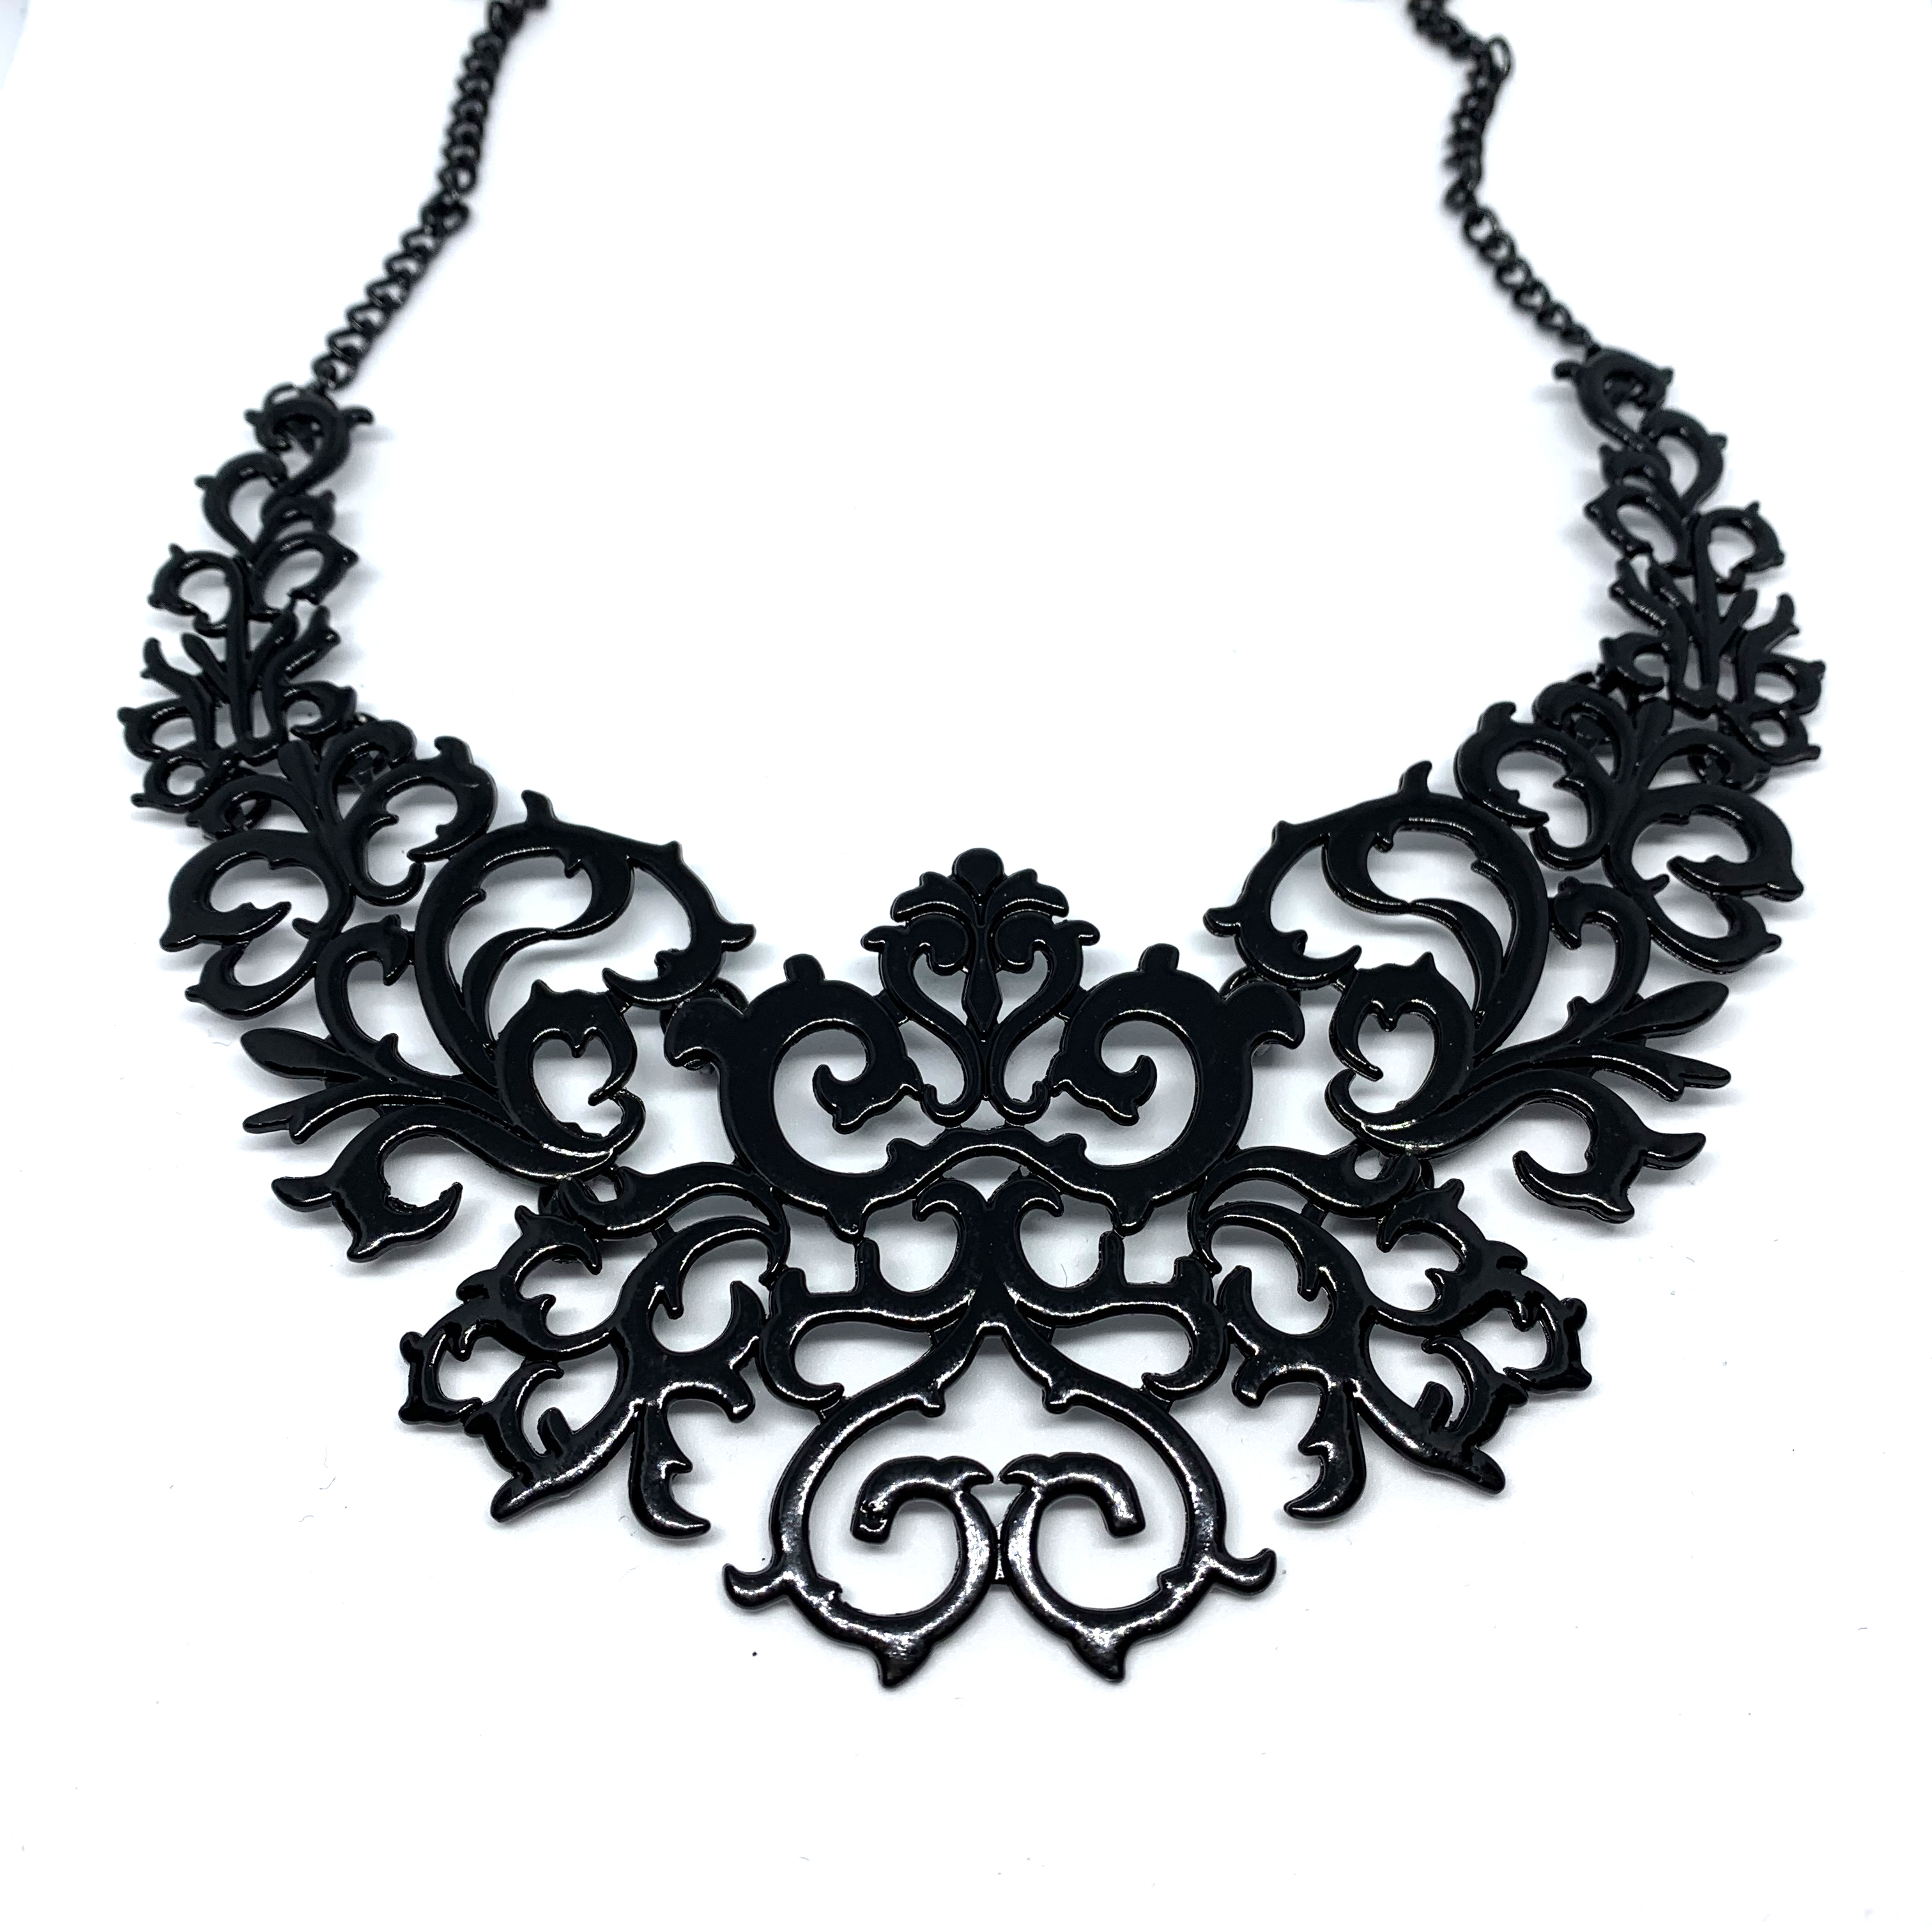 Black Filigree Necklace